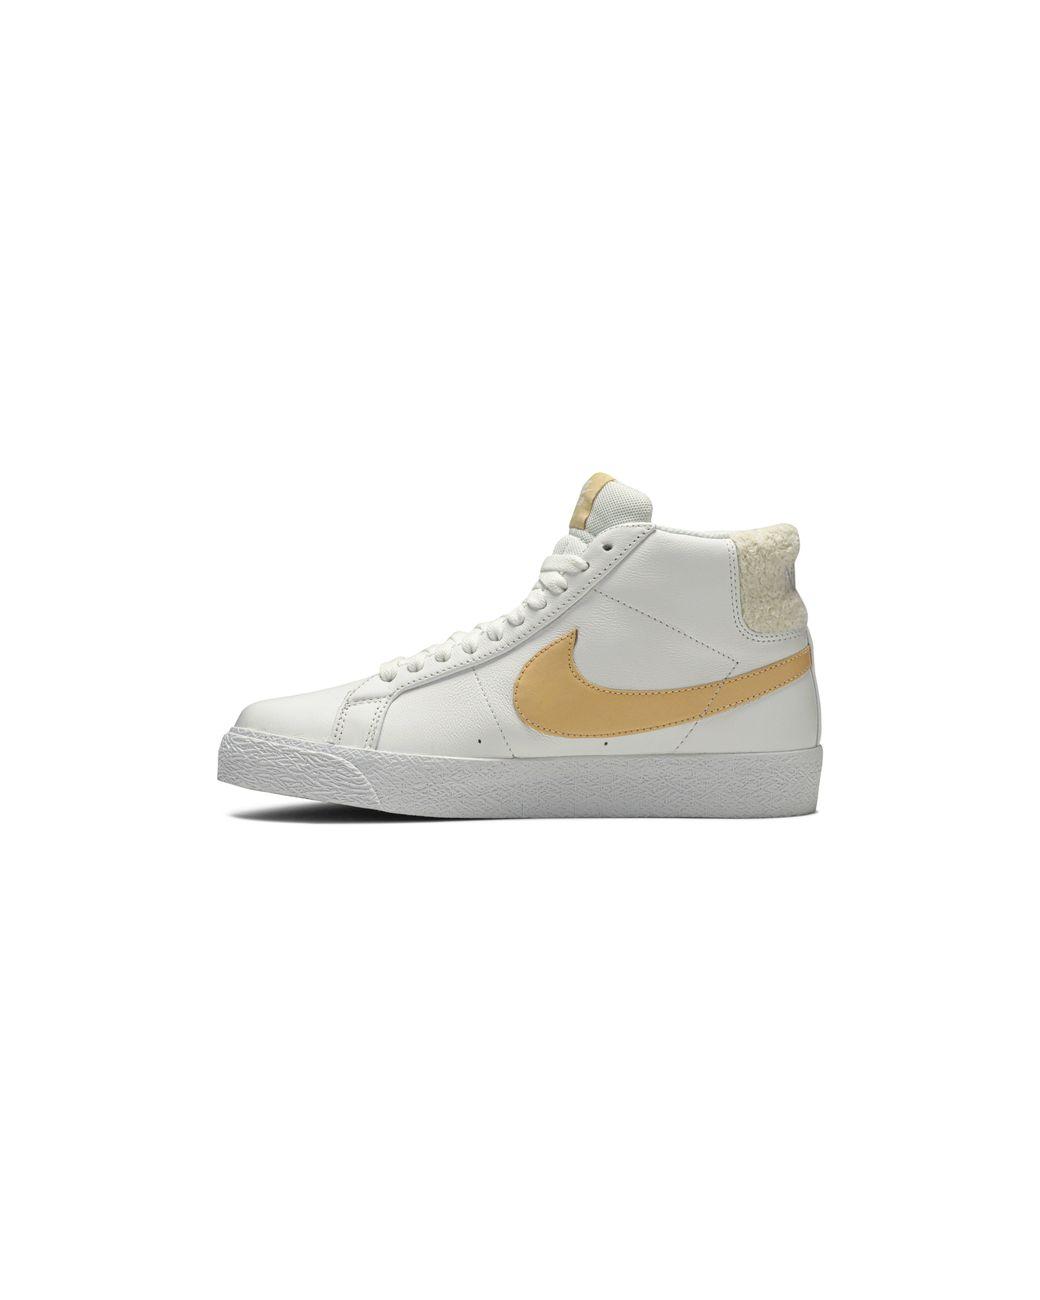 Nike Sb Zoom Blazer Mid Premium Skate